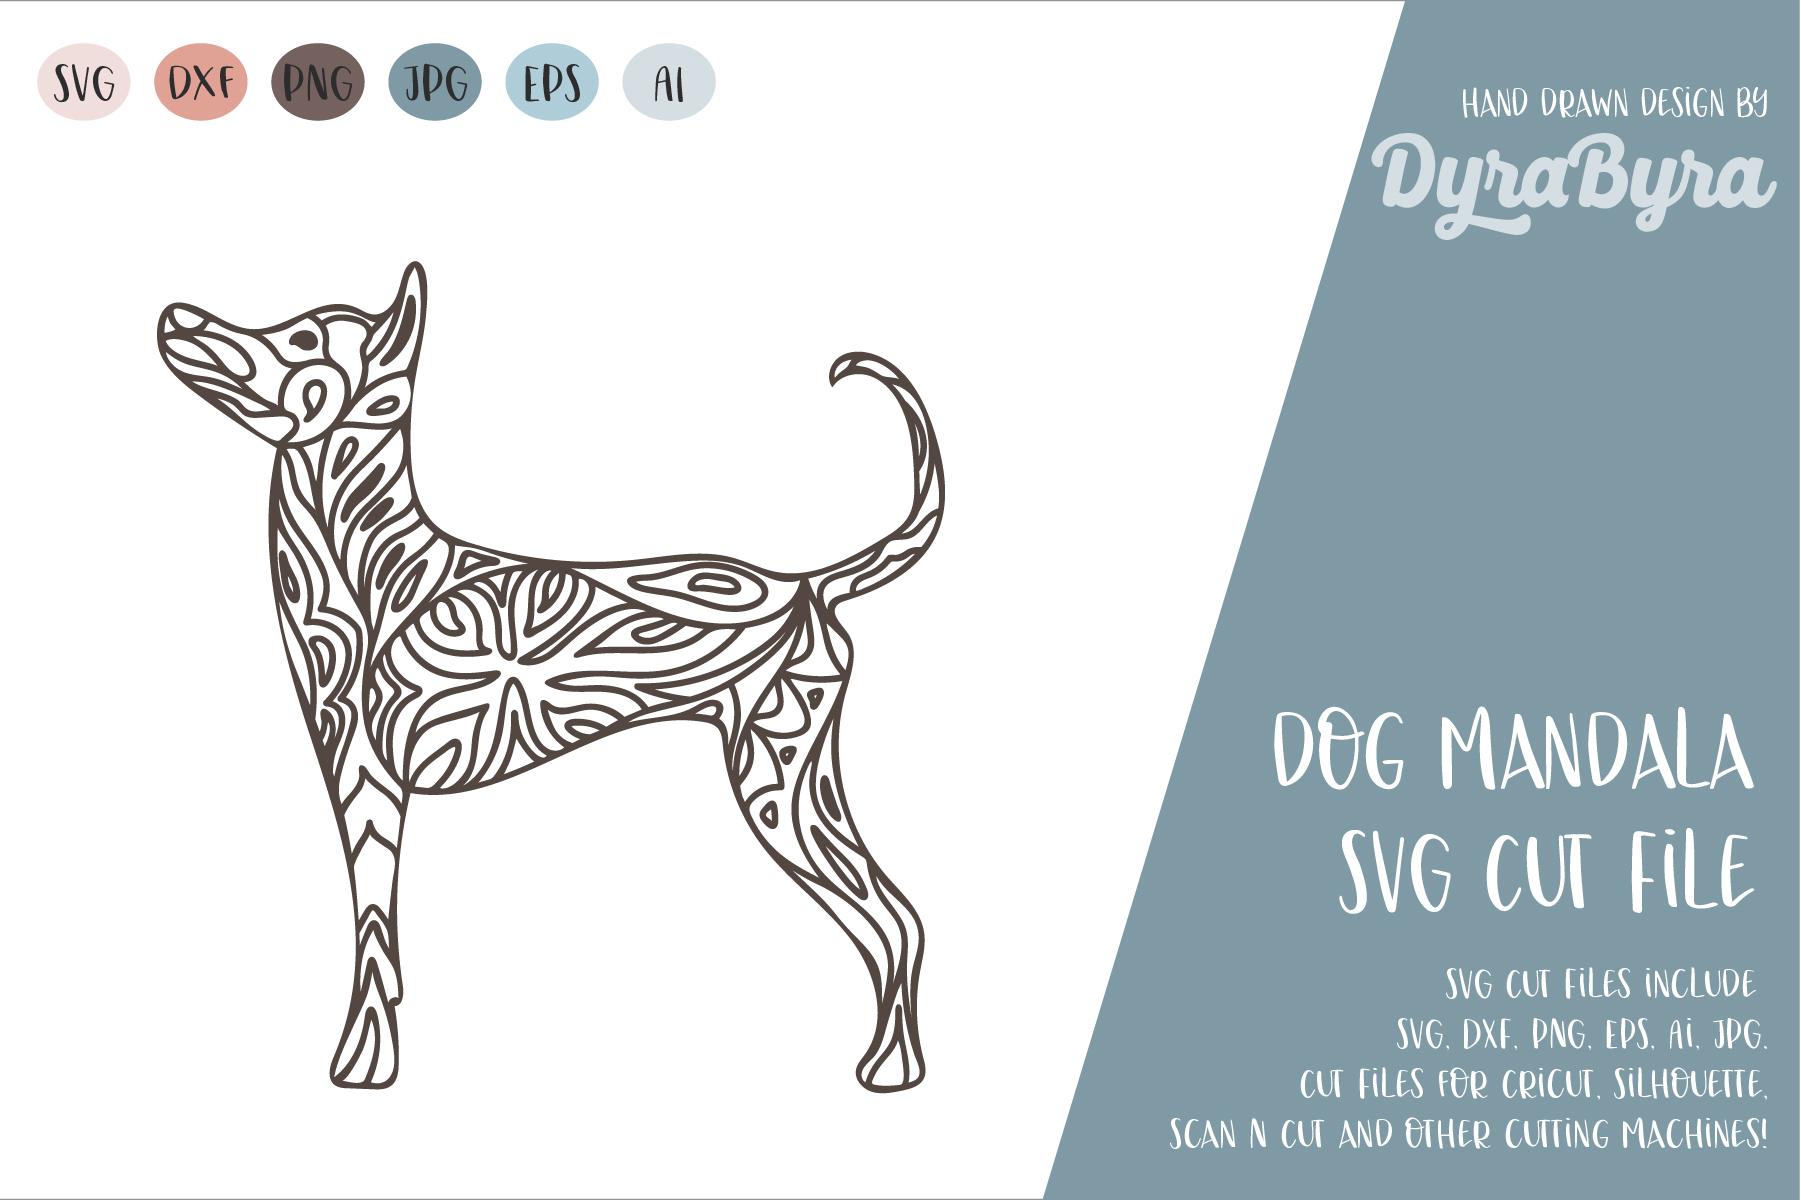 Dog Mandala SVG / Dog SVG / Zentangle SVG / Boho SVG example image 2